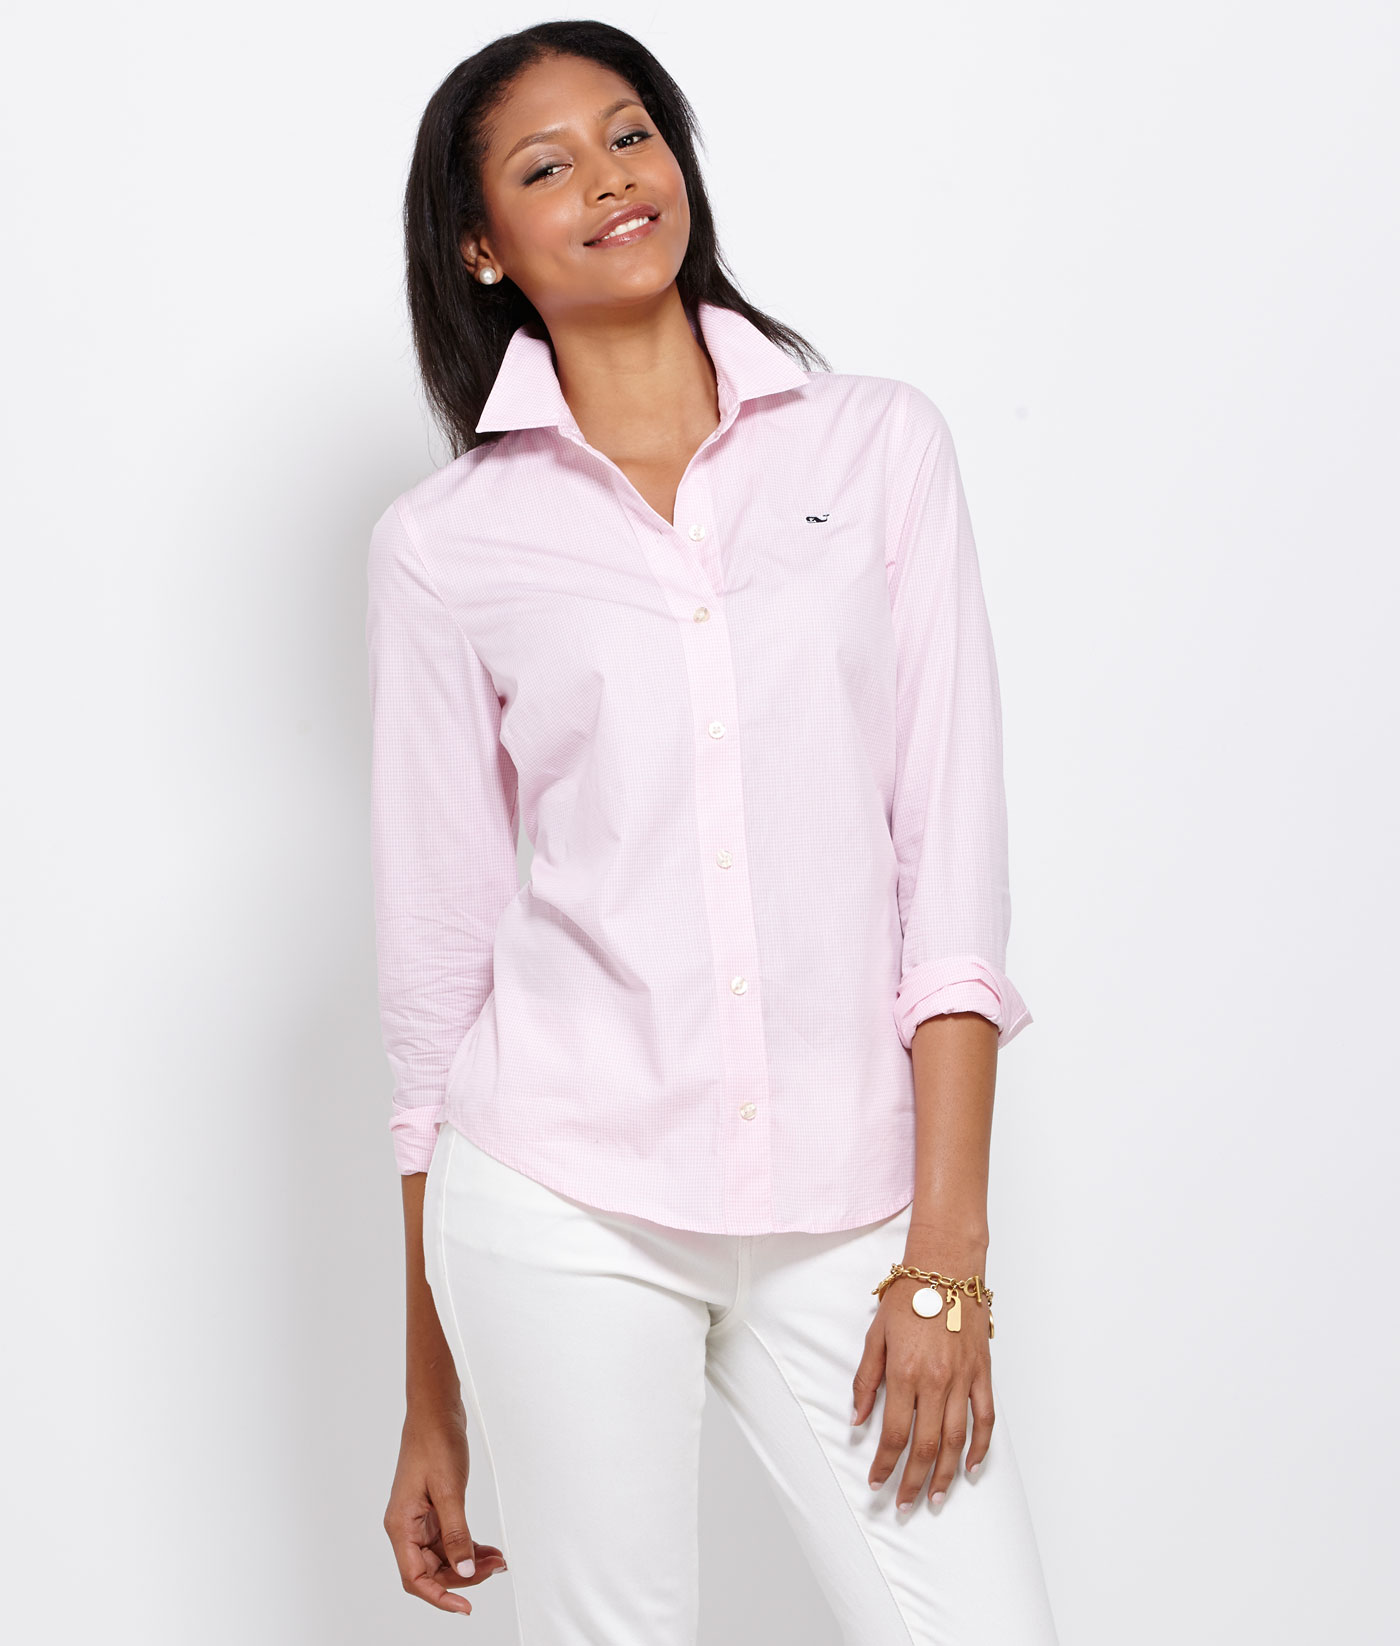 a1952645 Women's Button Down Shirts: Small Gingham Shirt – Vineyard Vines